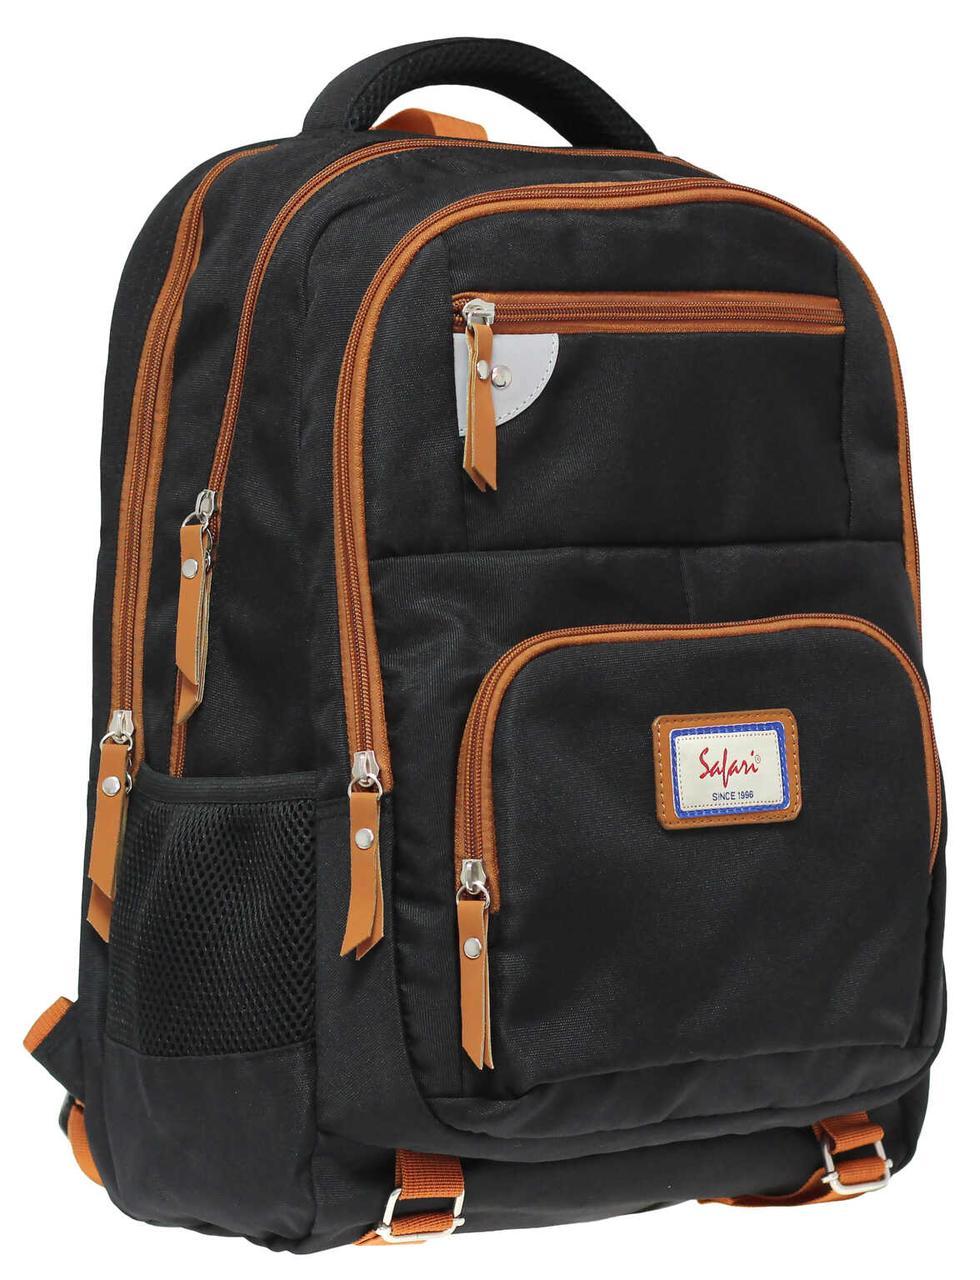 Рюкзак, 3 отд., 44*28*20см, полиестер, 19-130L-1, SAF